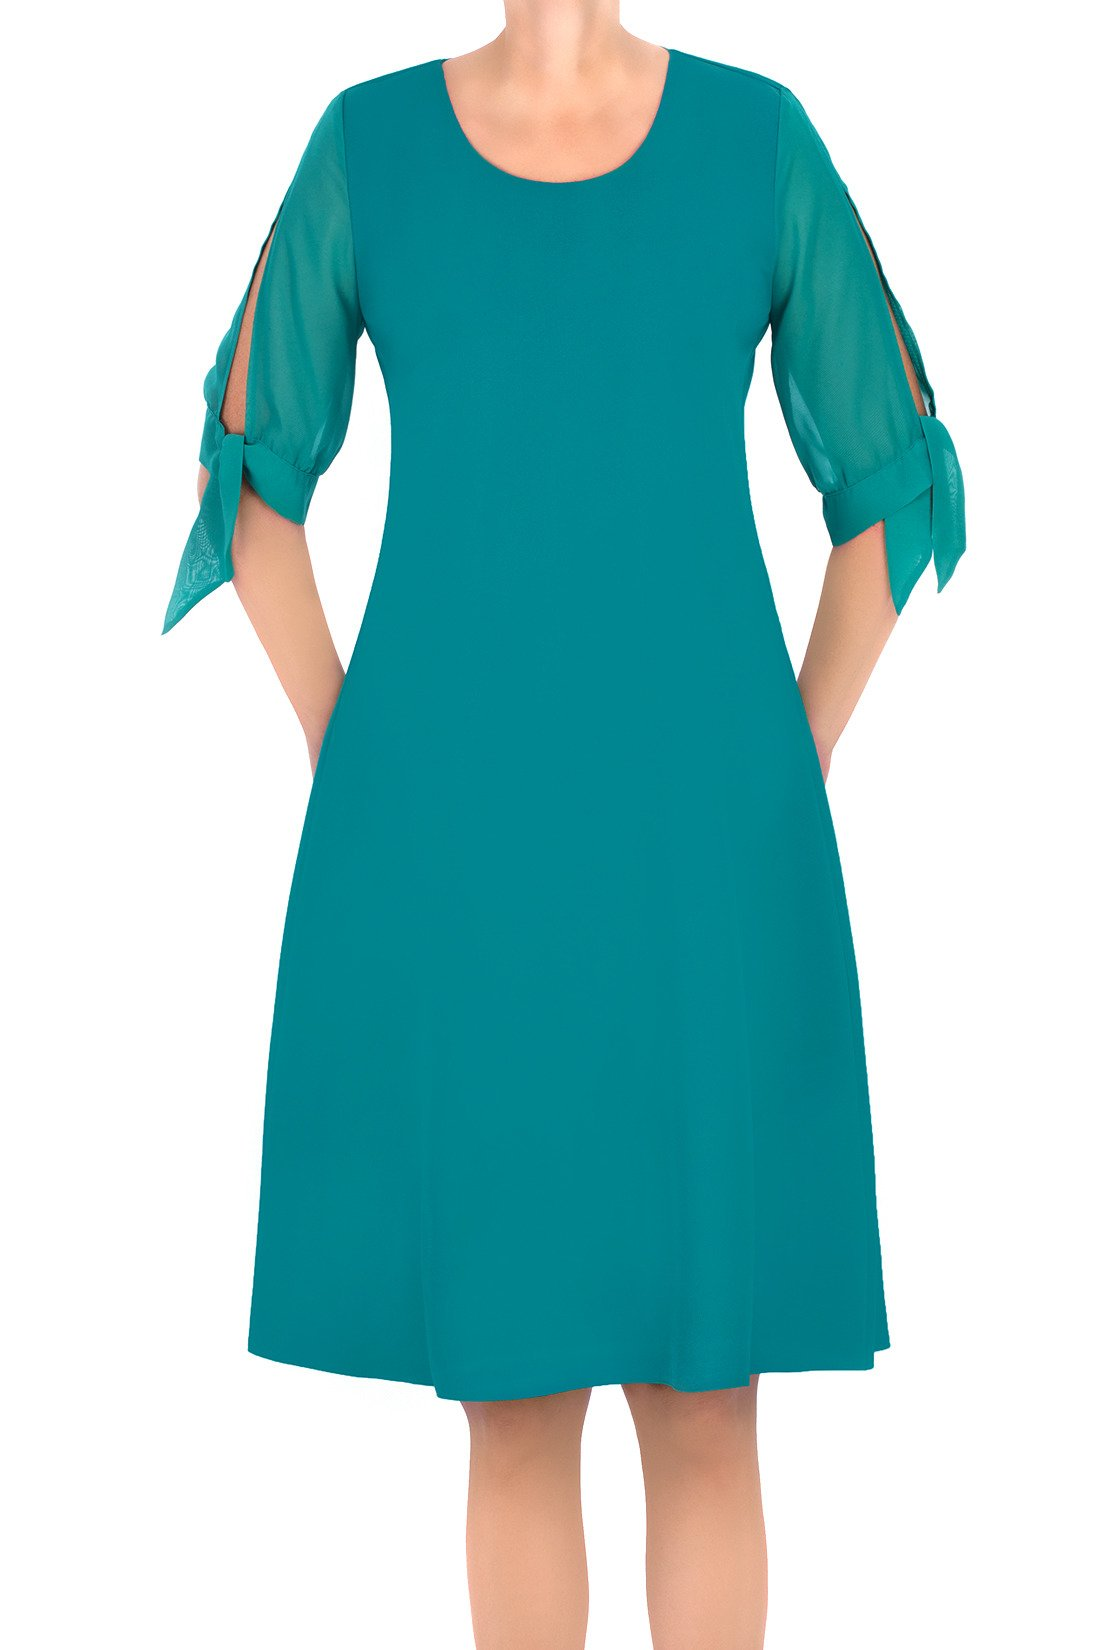 5358cc83 Zwiewna sukienka Żan-Mar trapezowa morska zieleń